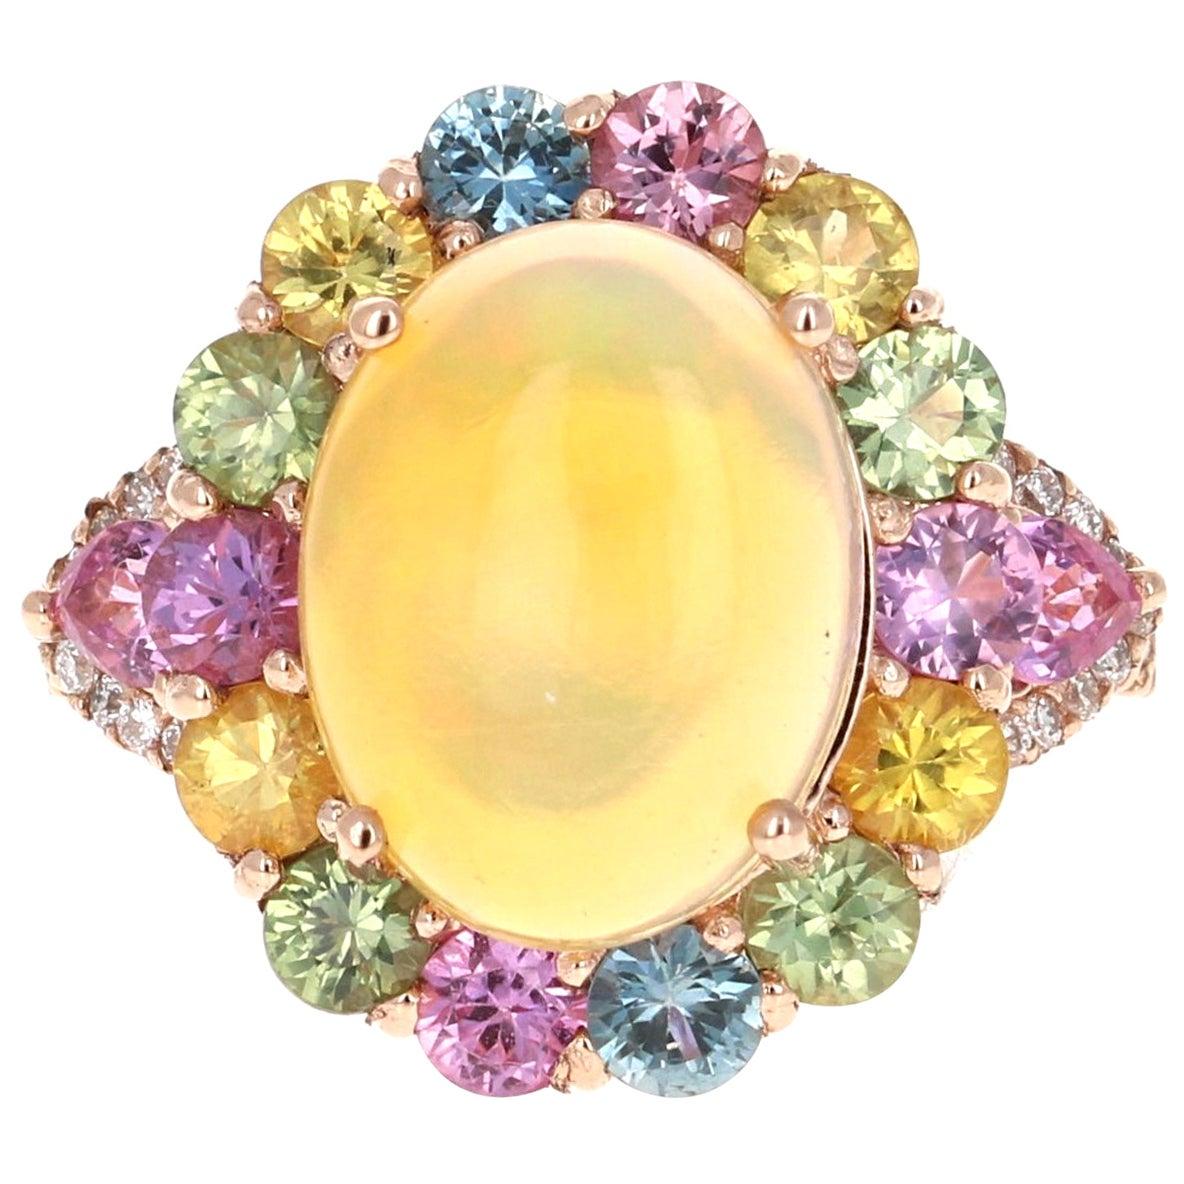 6.05 Carat Oval Cut Opal Sapphire Diamond 14 Karat Rose Gold Cocktail Ring